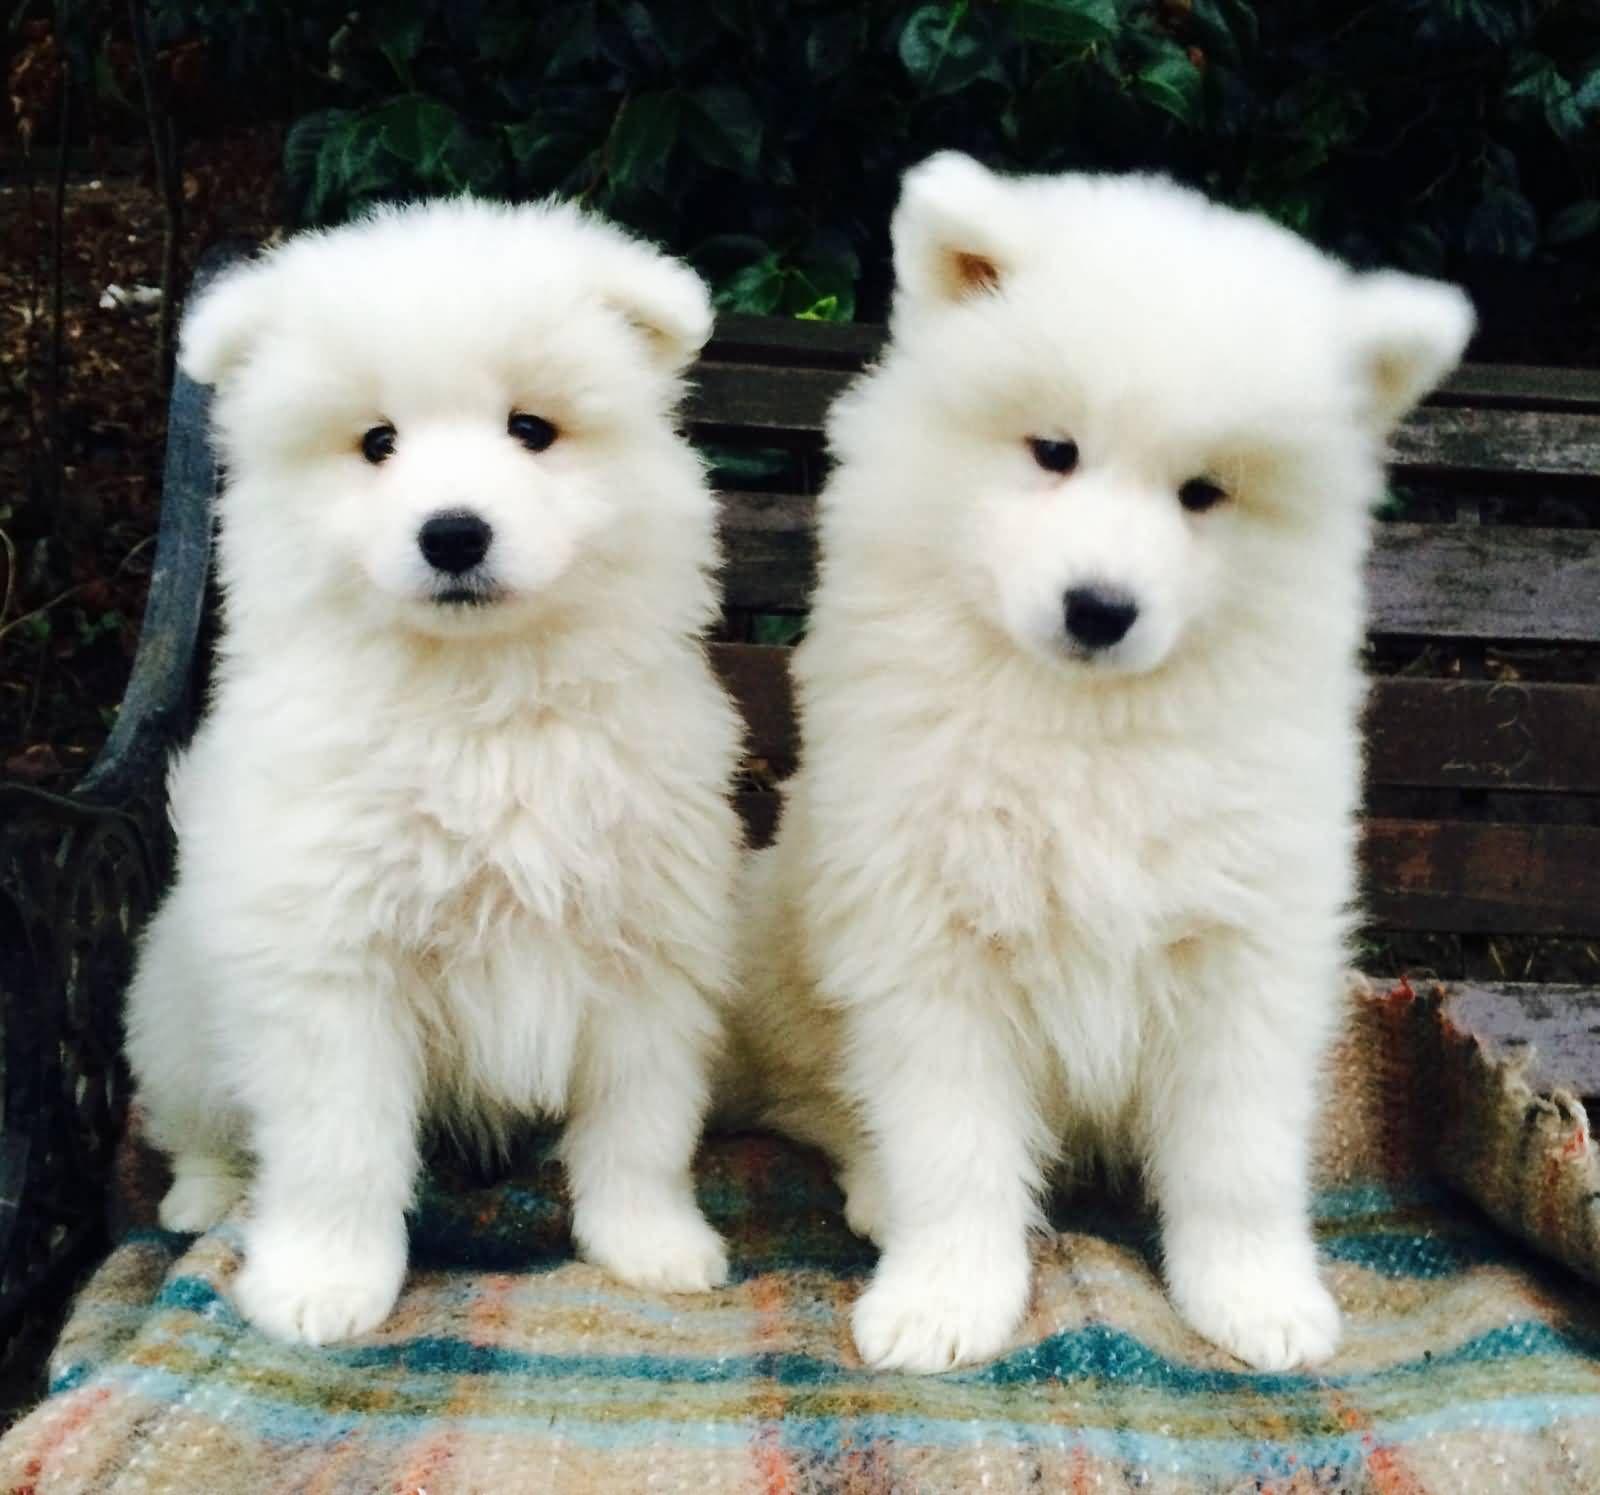 Emmaruth S 2 Pedigree Sayomed Dogs Michael And Jon Samoyed